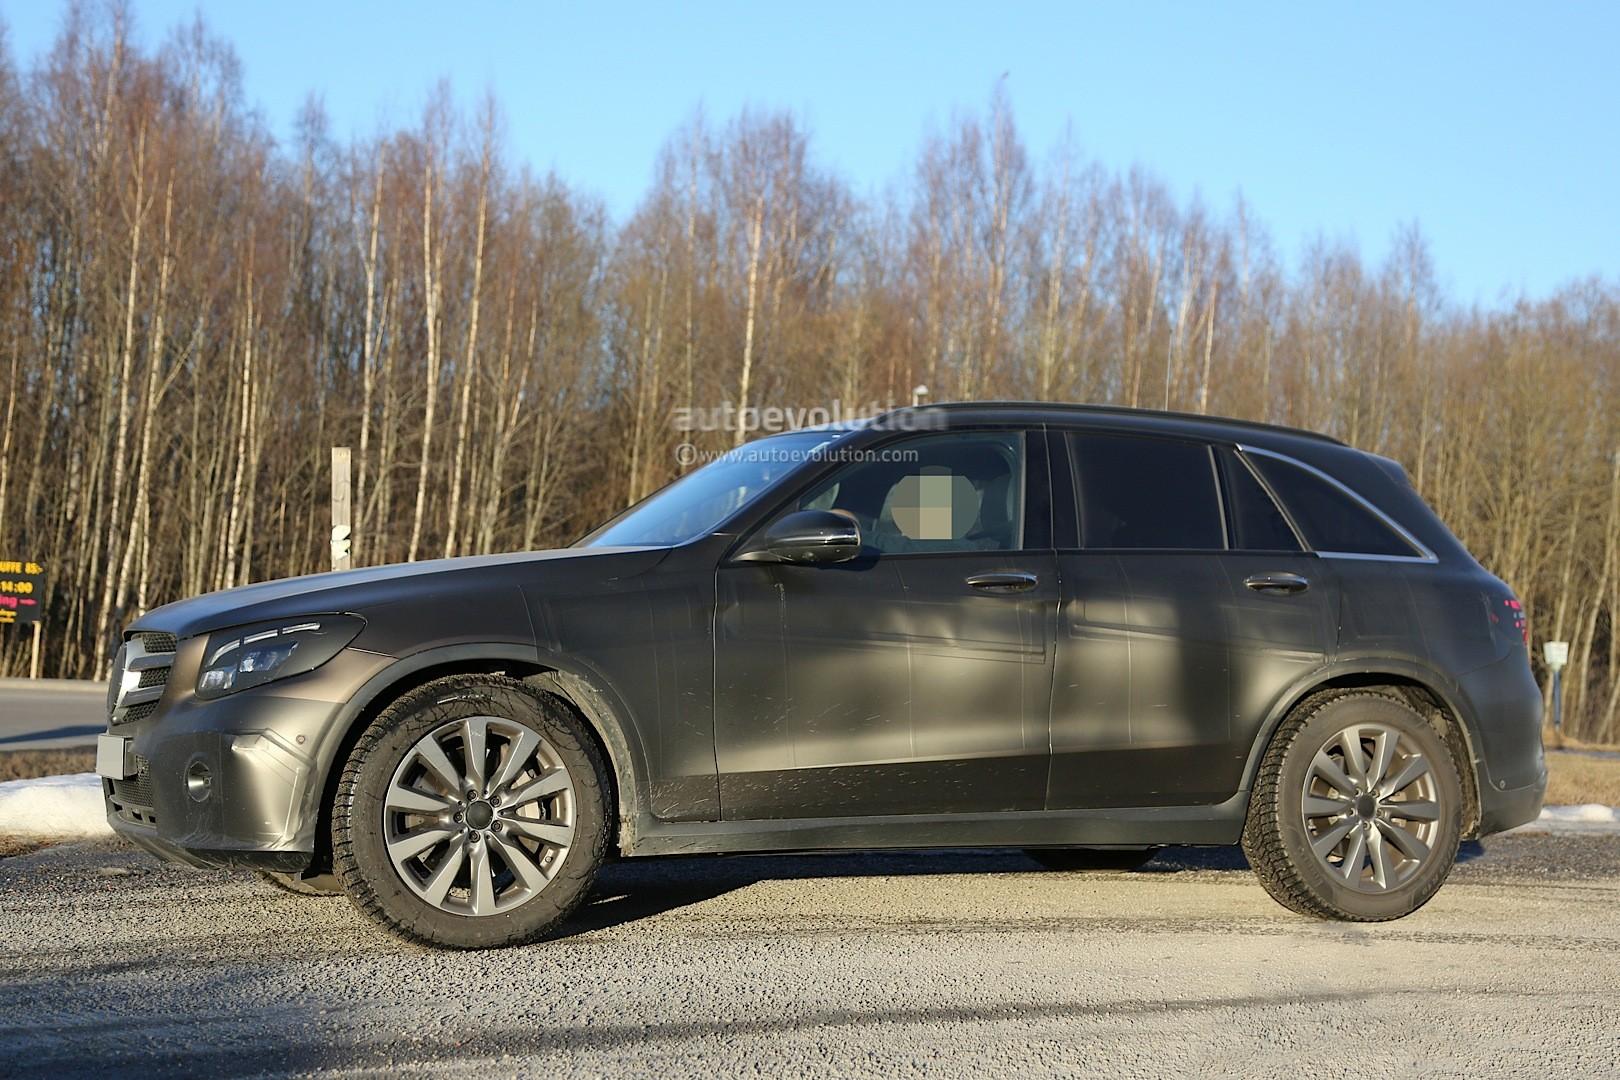 2015 - [Mercedes] GLC (GLK II) [X205] - Page 10 2016-mercedes-glc-spy-photos-show-nearly-undisguised-pre-production-prototypes_14